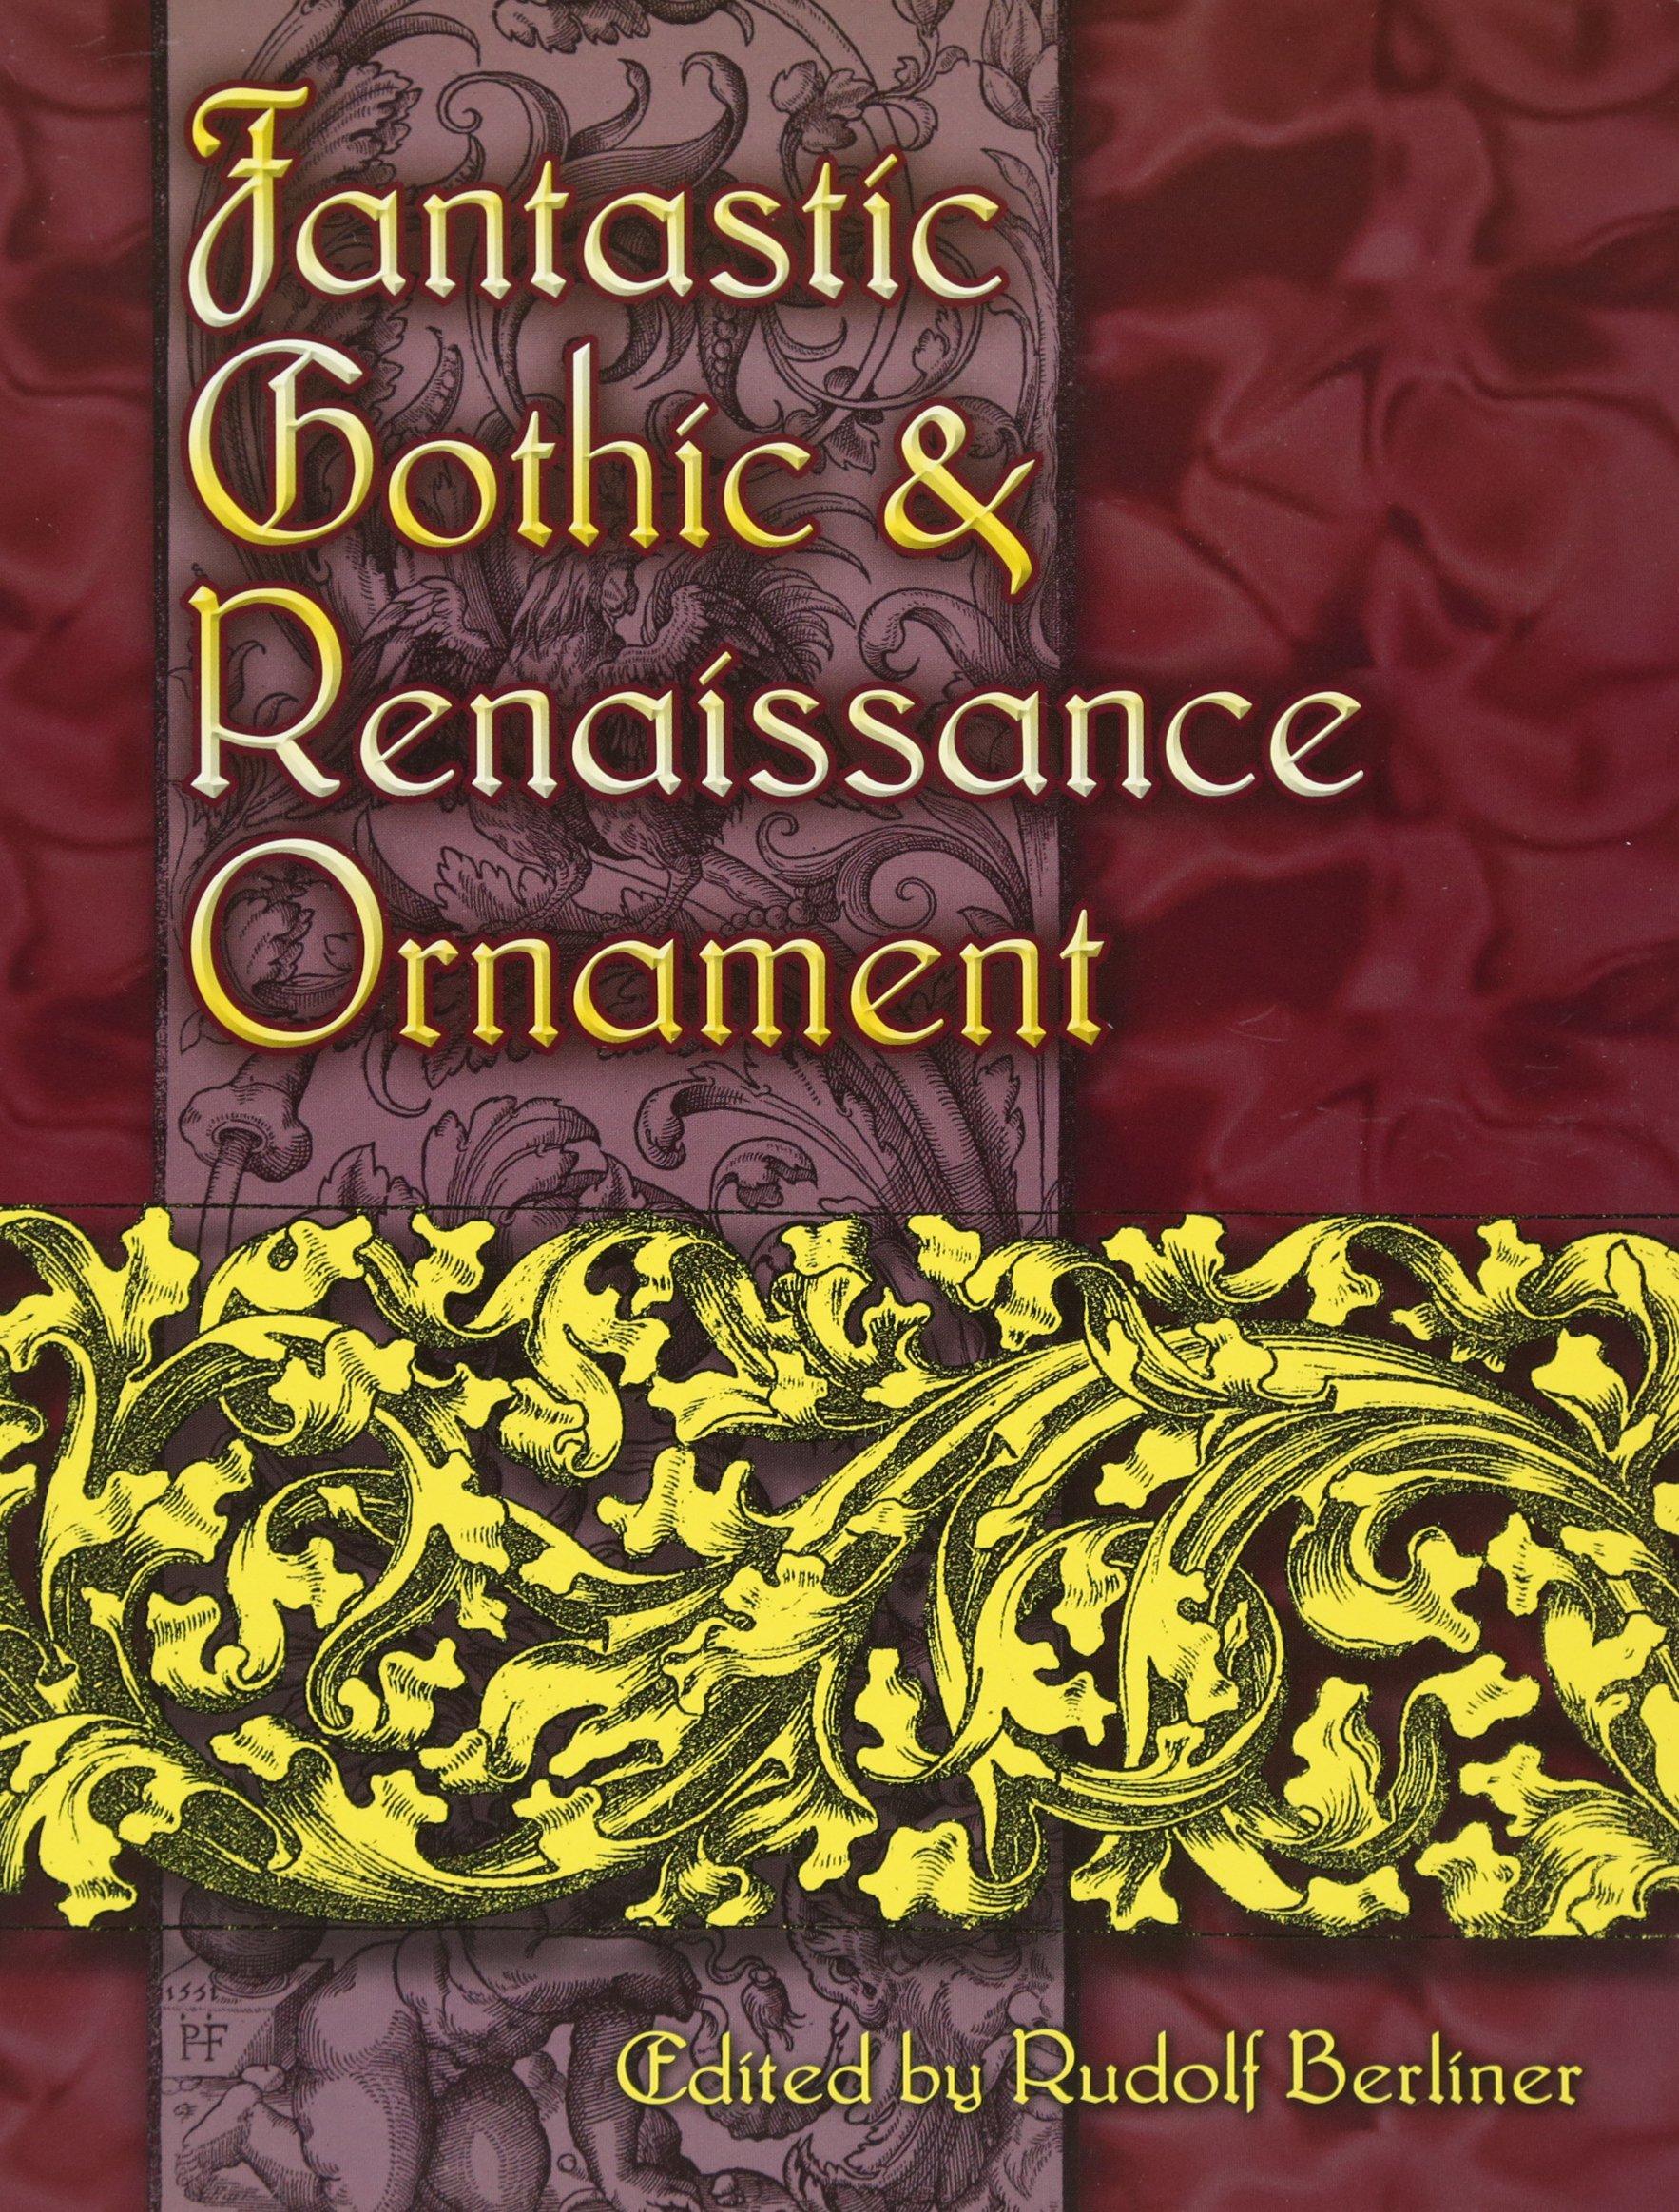 Fantastic Gothic and Renaissance Ornament (Dover Pictorial Archive)